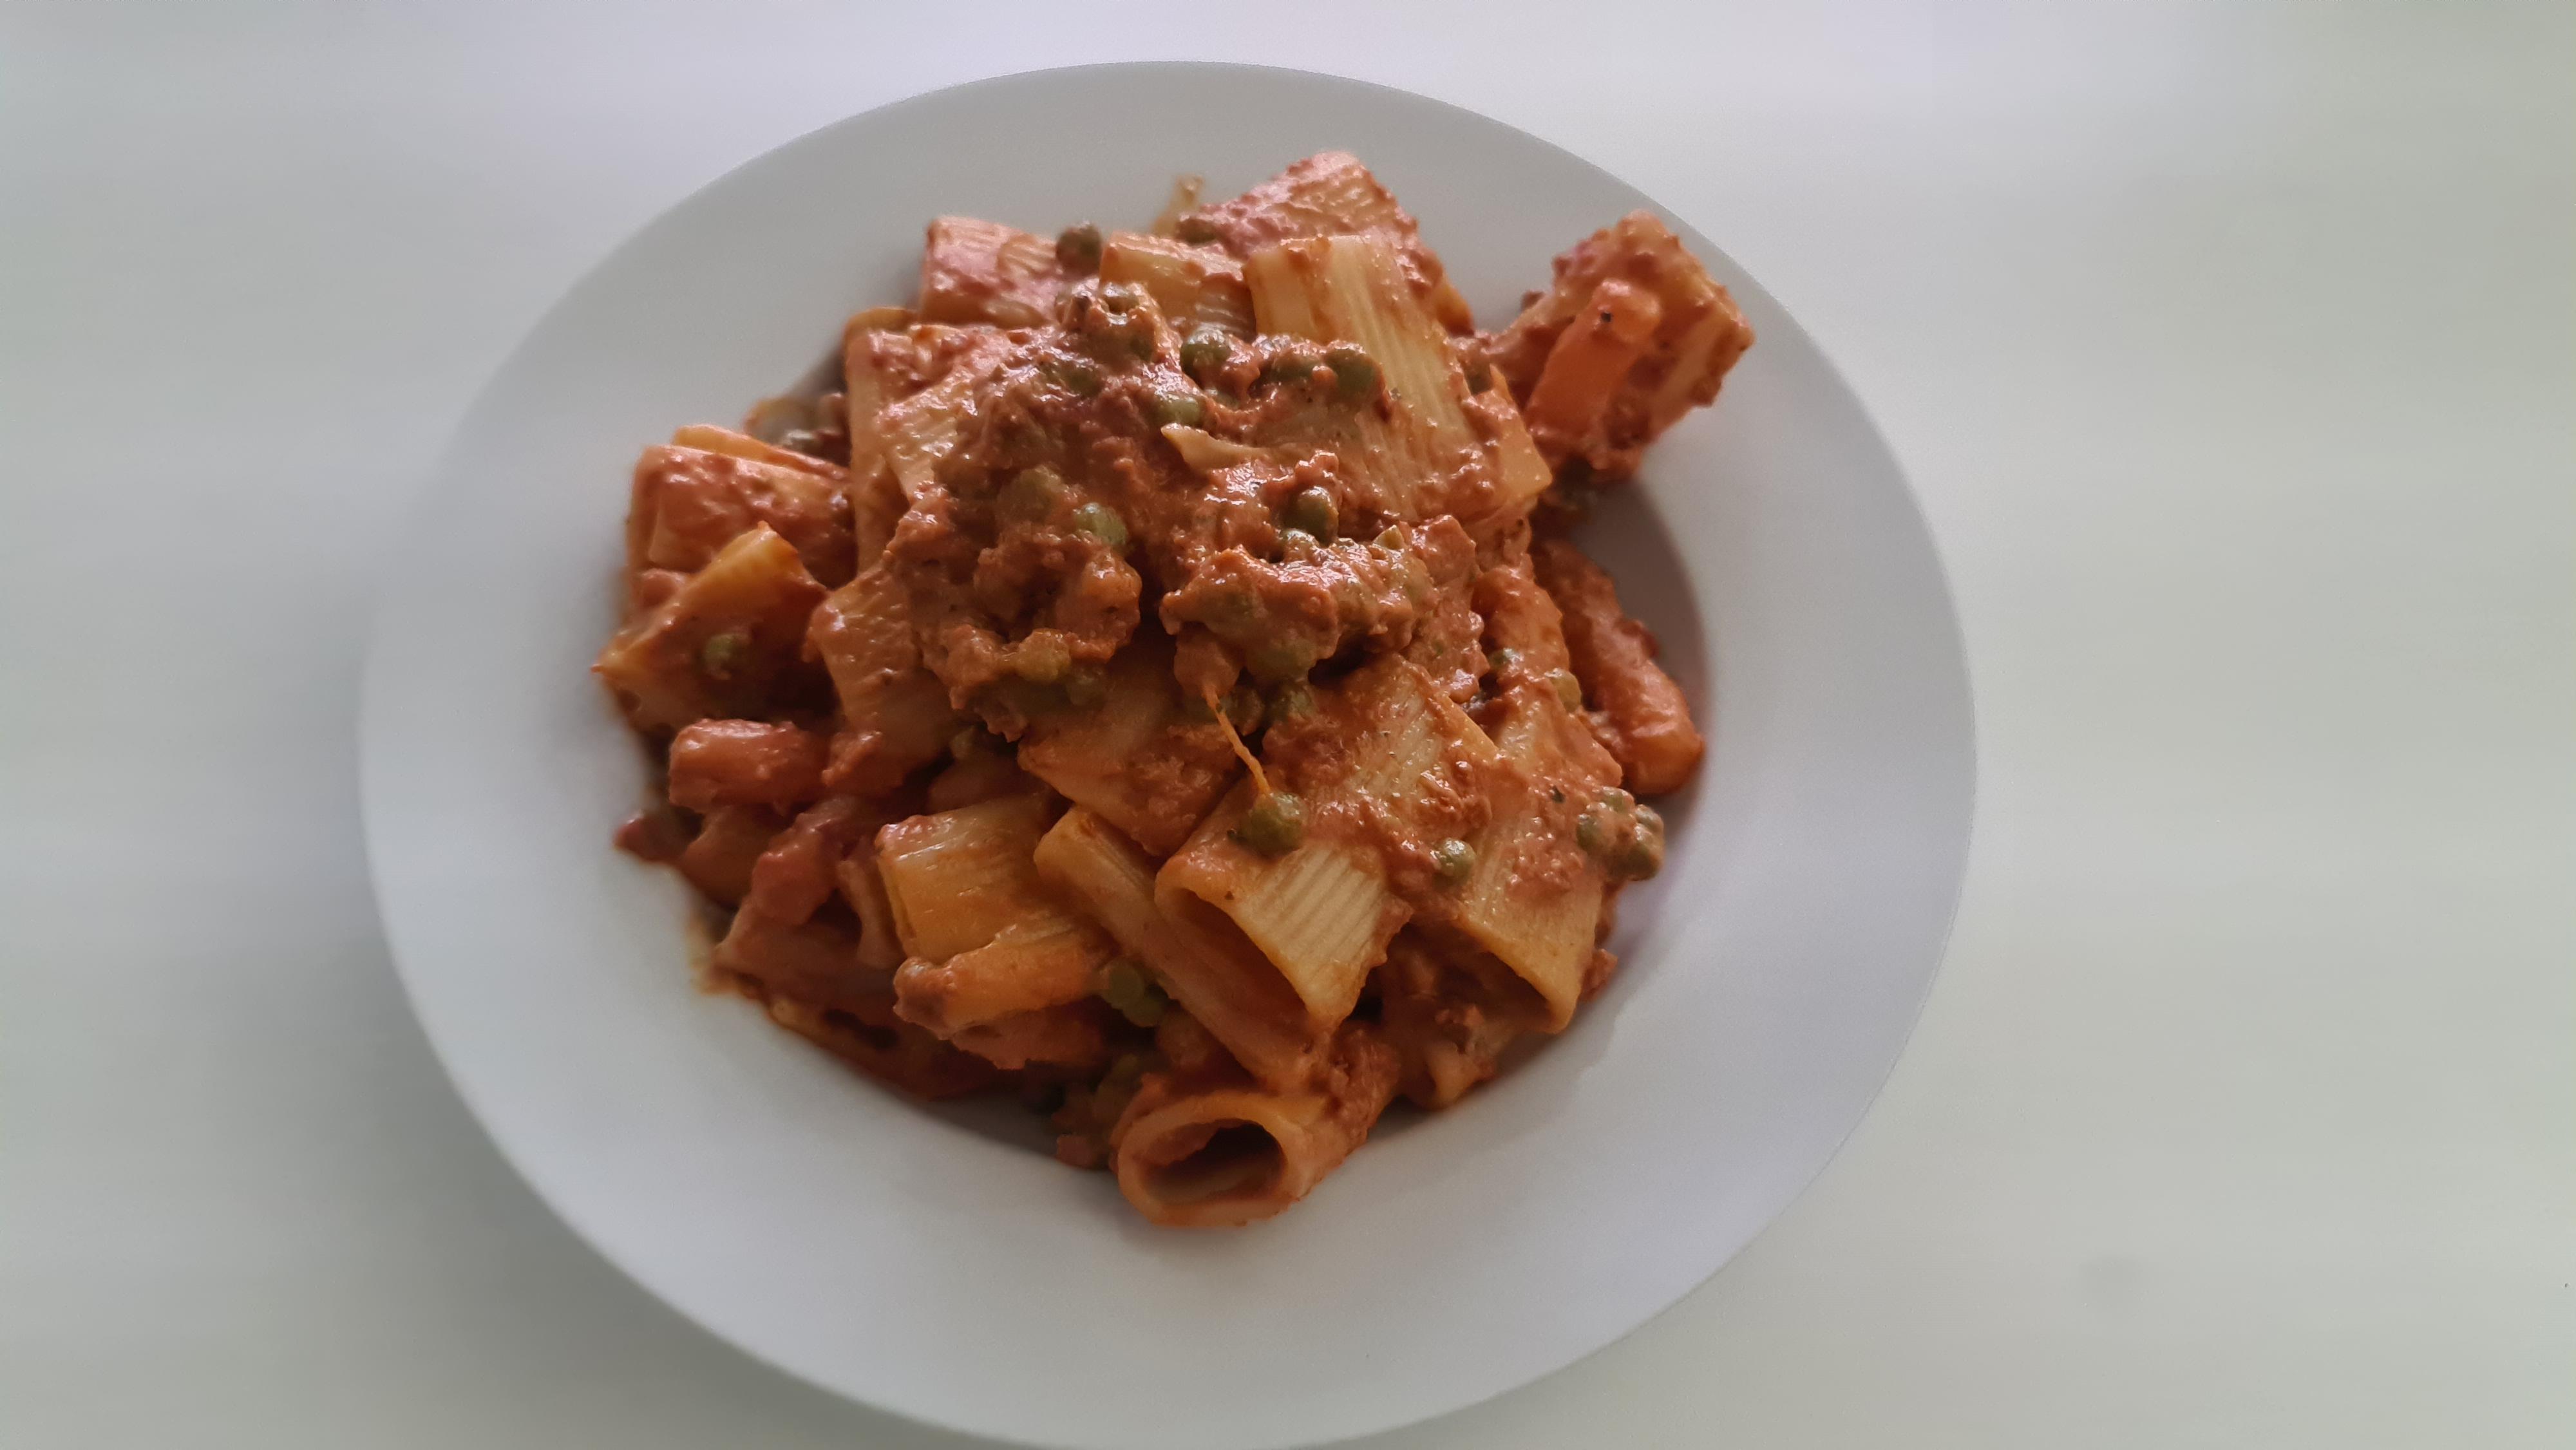 https://foodloader.net/Holz_2020-08-21_Rigatoni_Ricotta_e_Noci.jpg